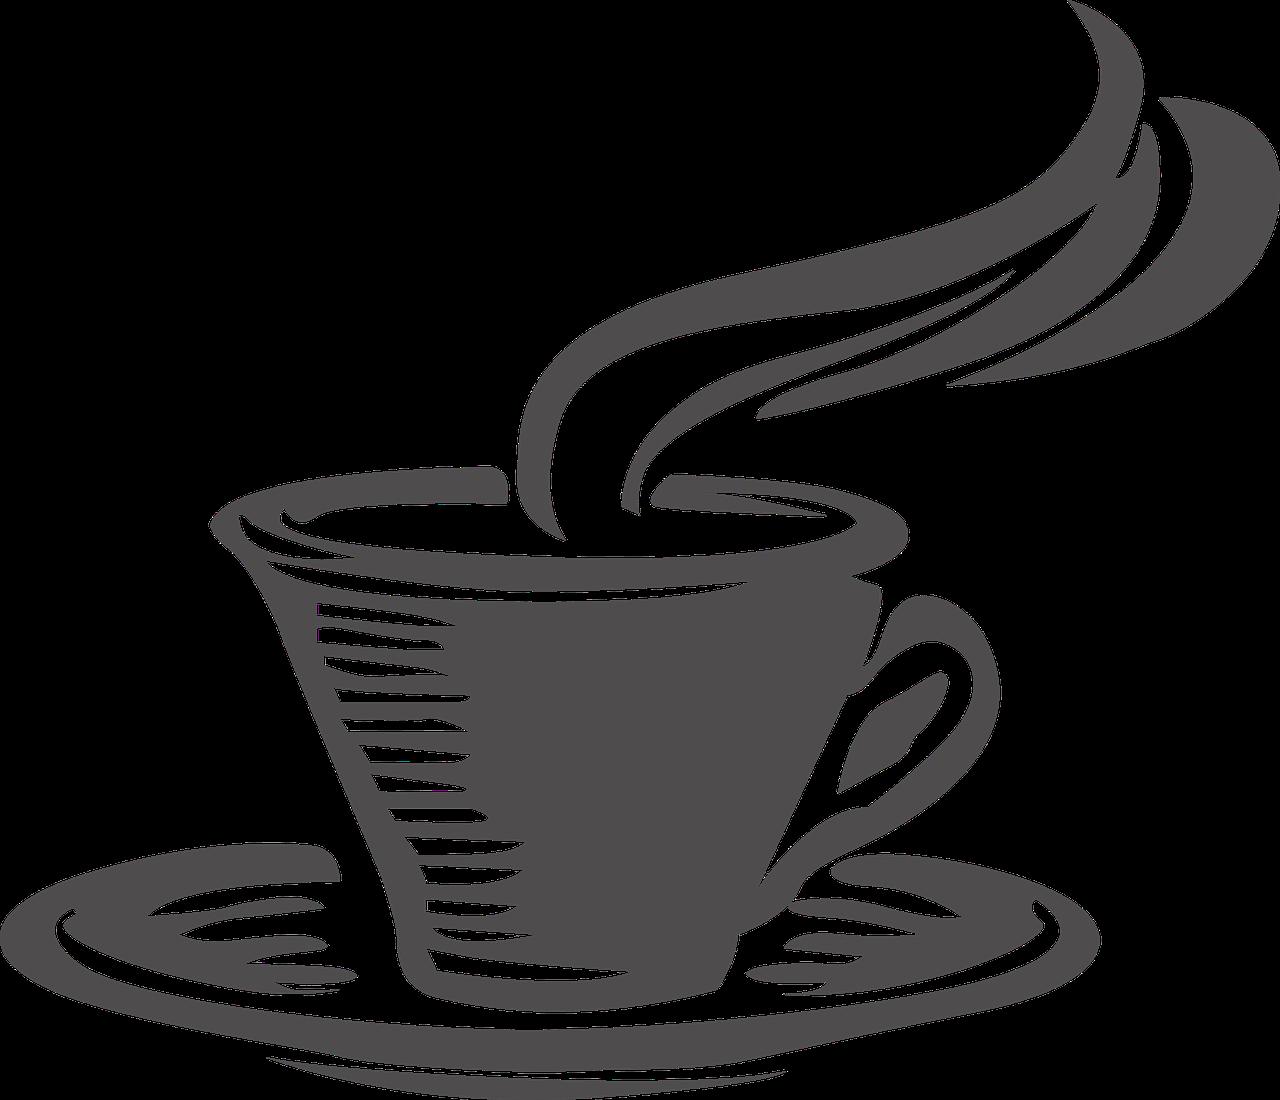 Mug clipart coffee bagel. Cup tea cafe clip